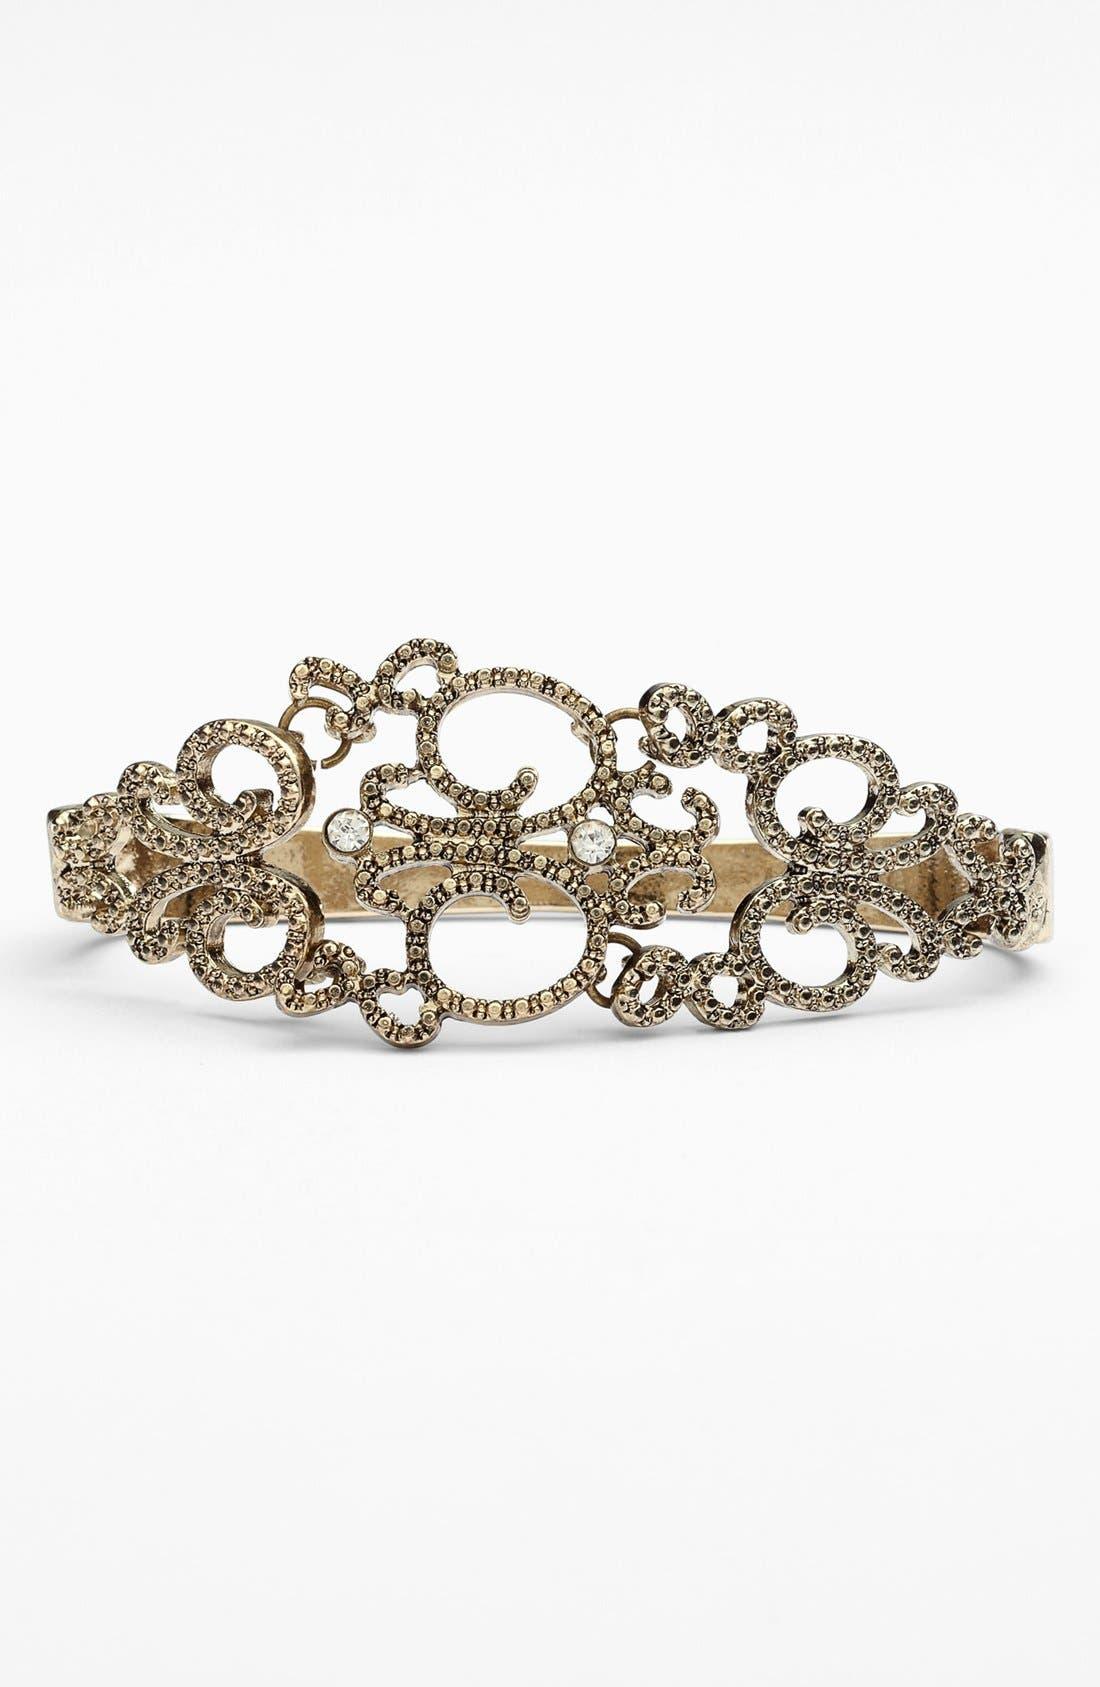 Main Image - Tildon 'Vintage' Hand Bracelet